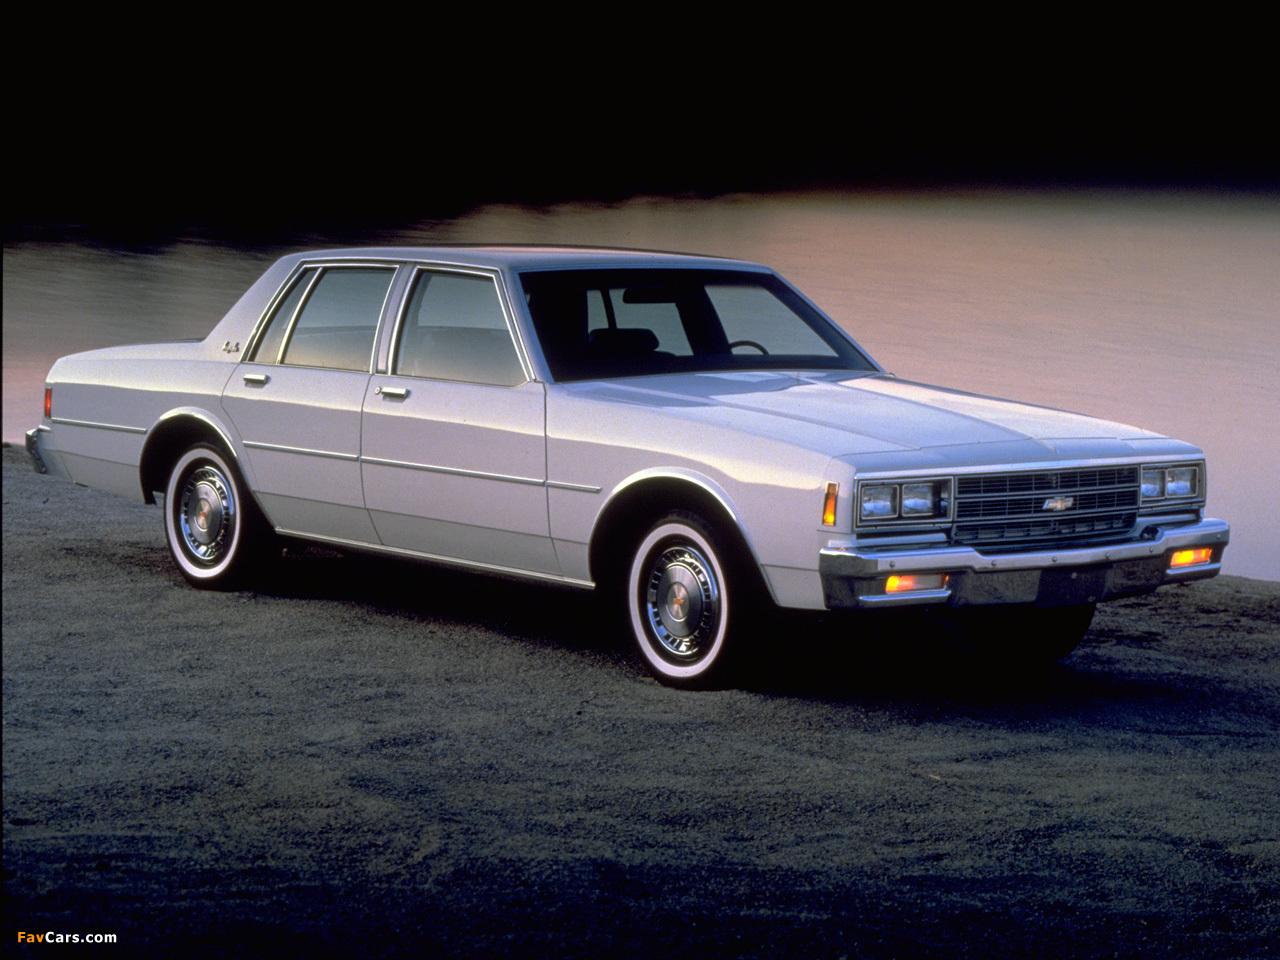 Photos Of Chevrolet Impala 1980 85 1280x960